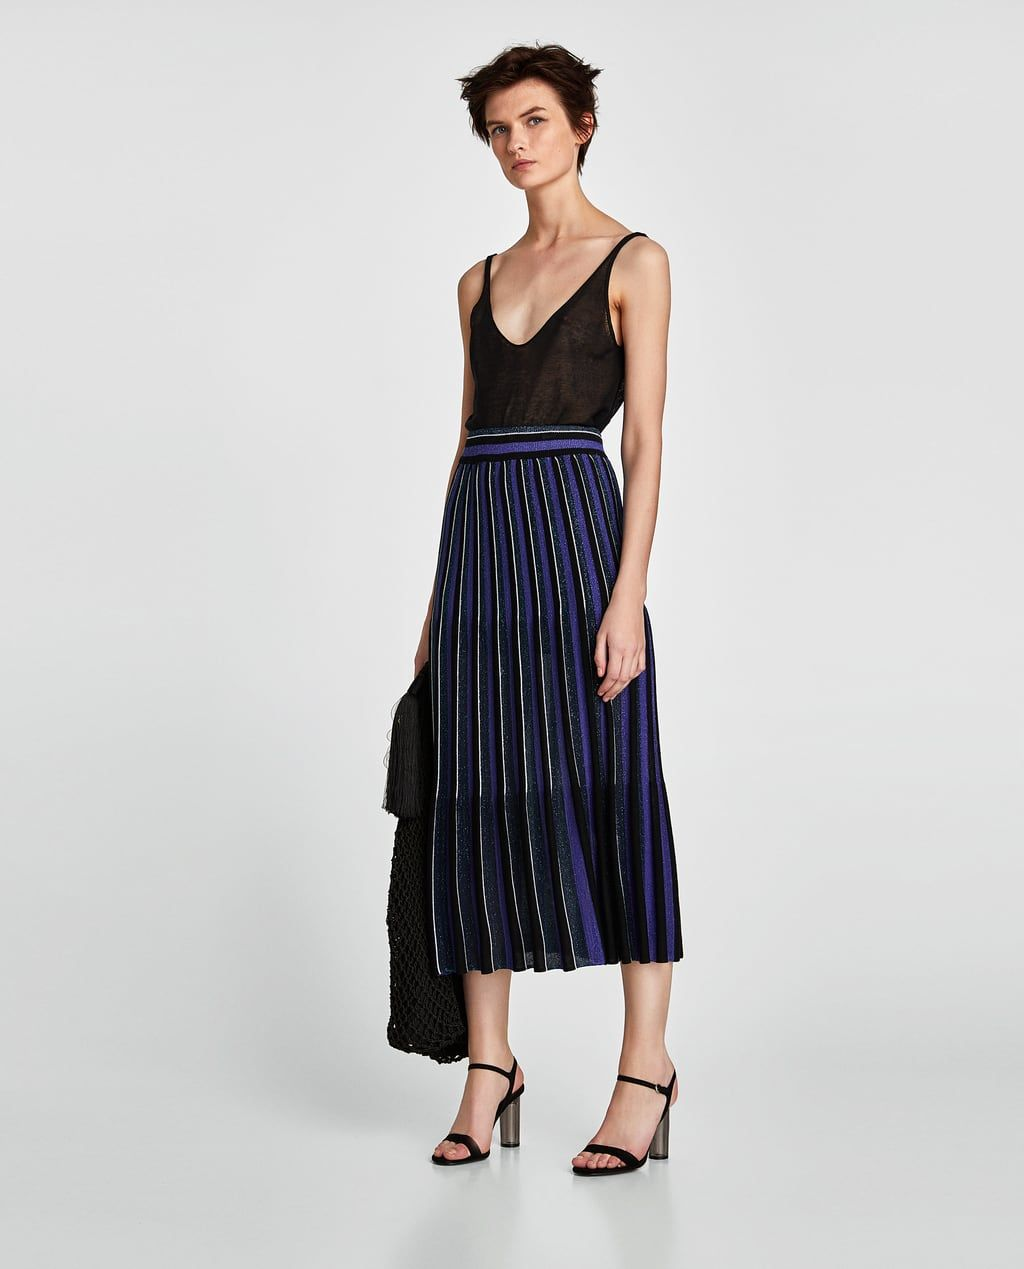 autentico d3182 3b020 Pullover strutturato | Zara | Gonne lunghe, Gonne lunghe a ...